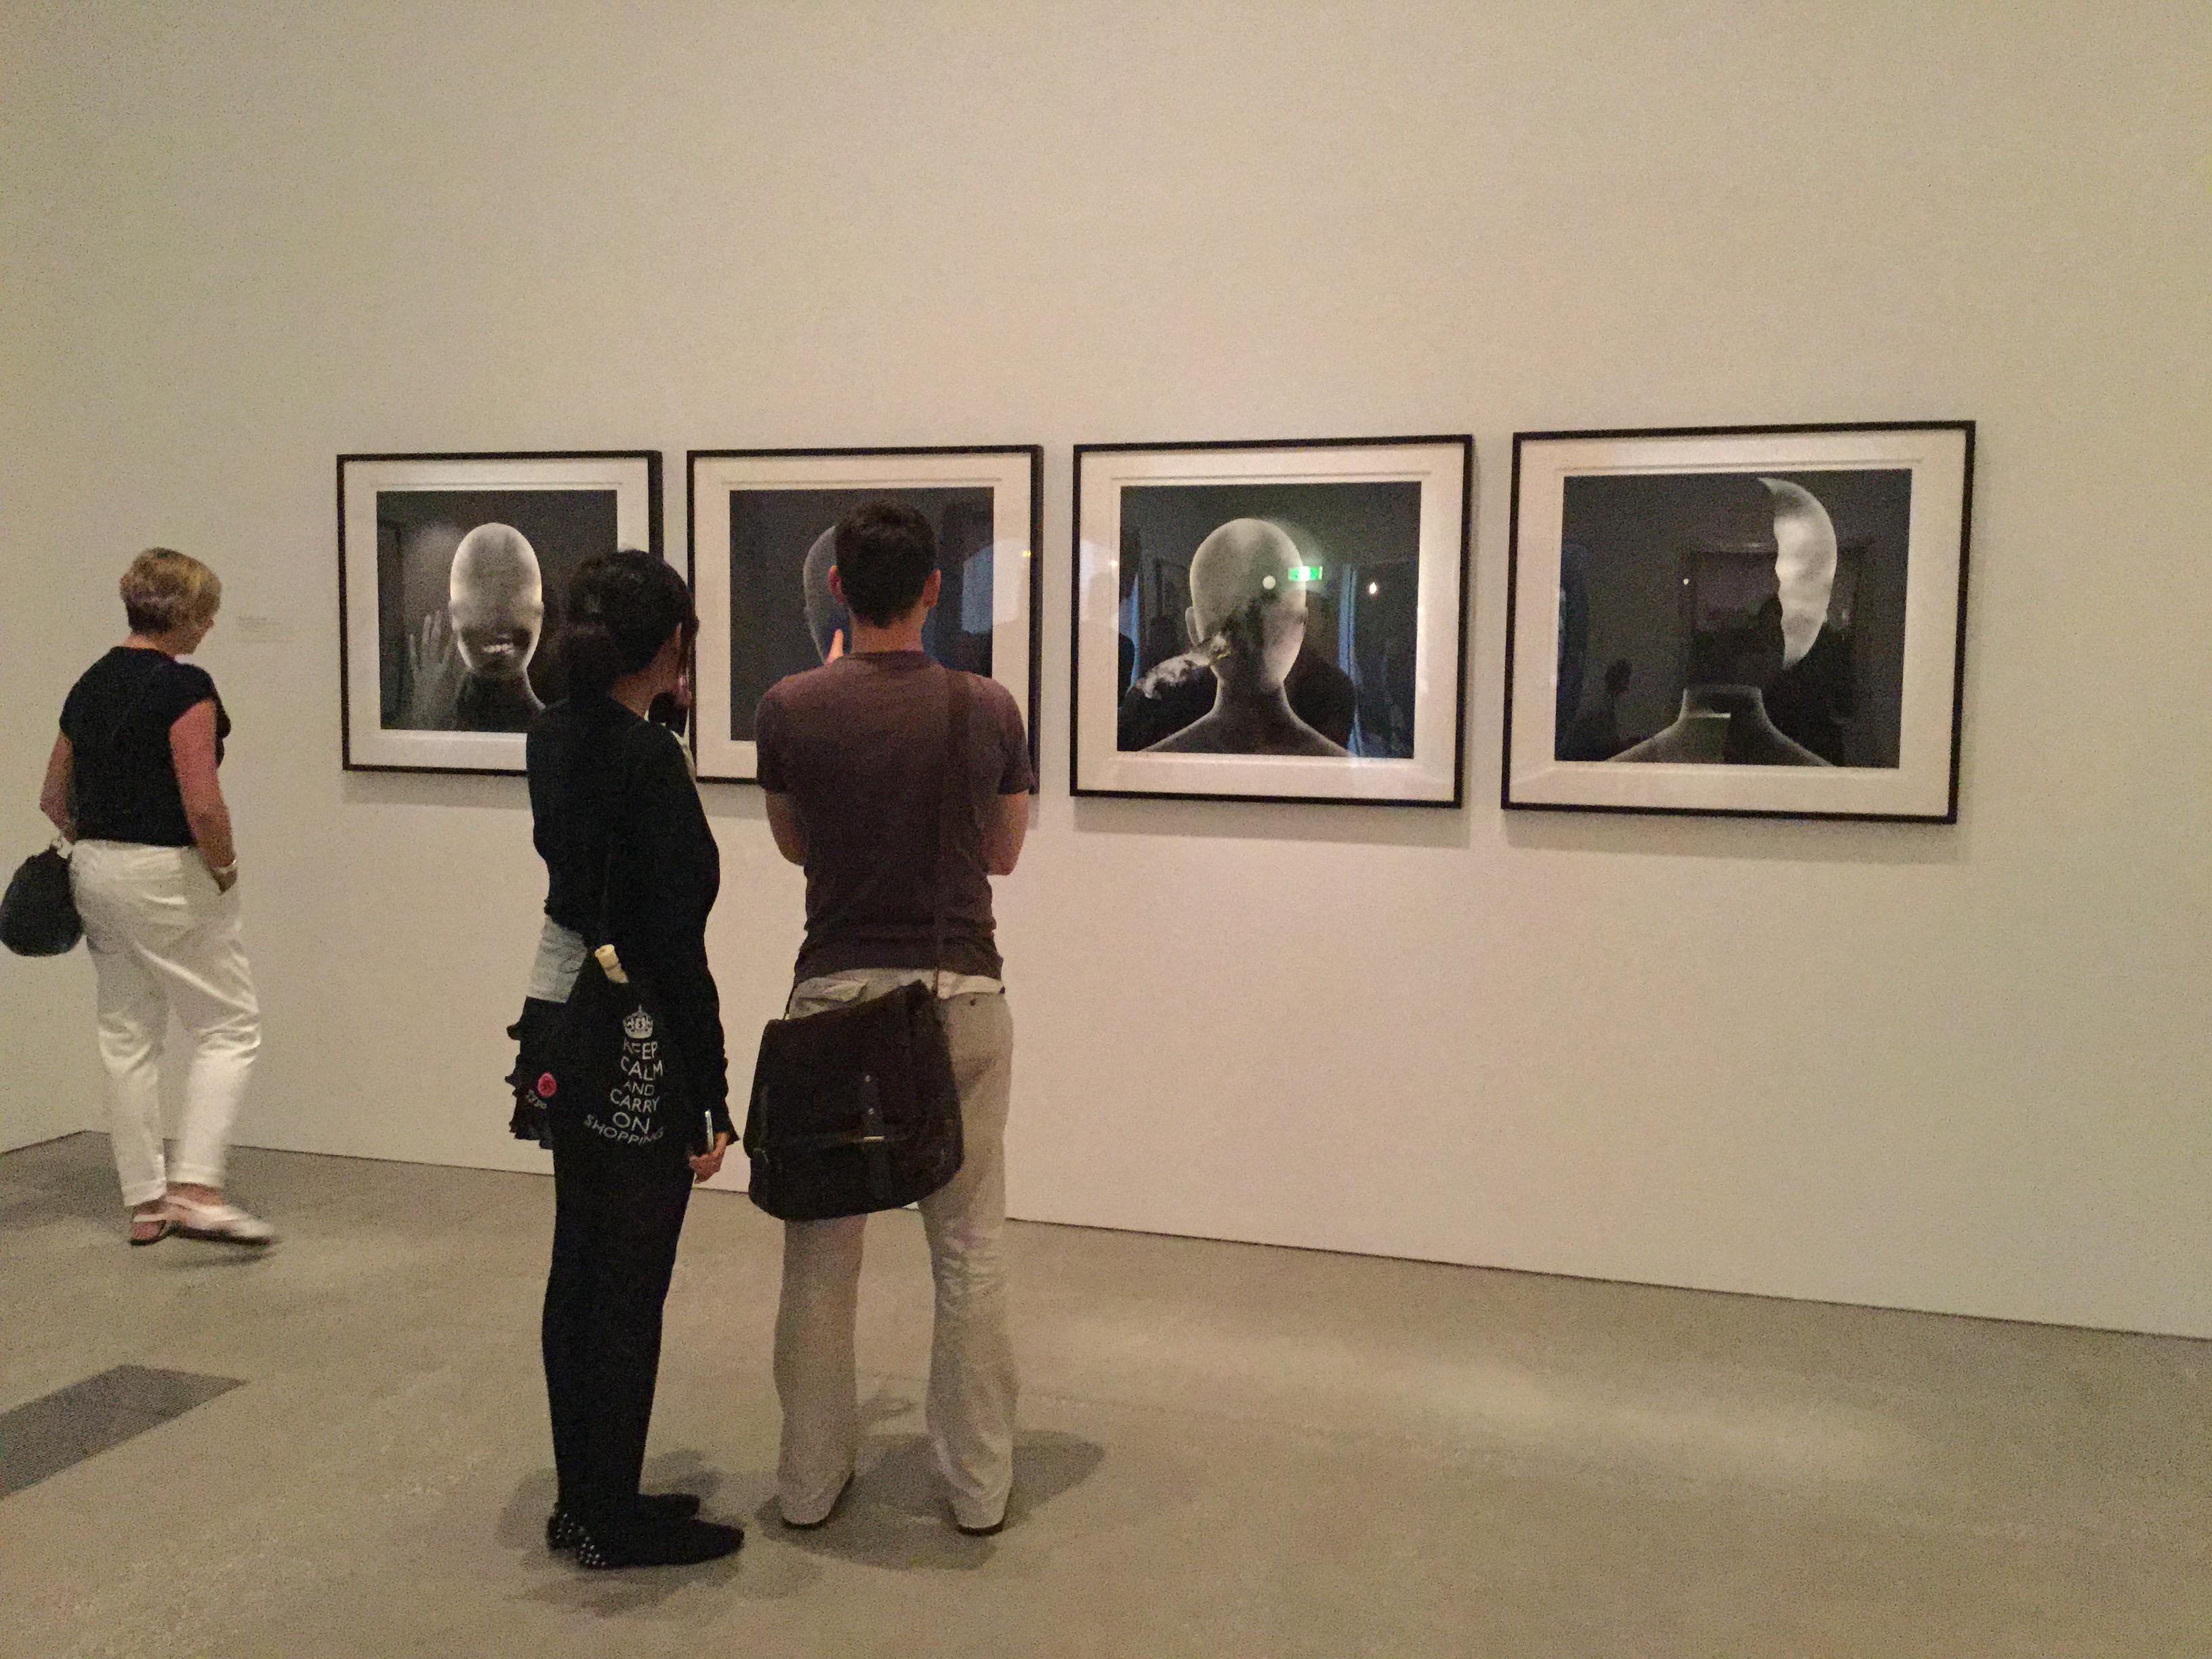 David Lynch's Head #6, #3, #2 and #15 on display at the GOMA. (Photo by Natasha Emeck)